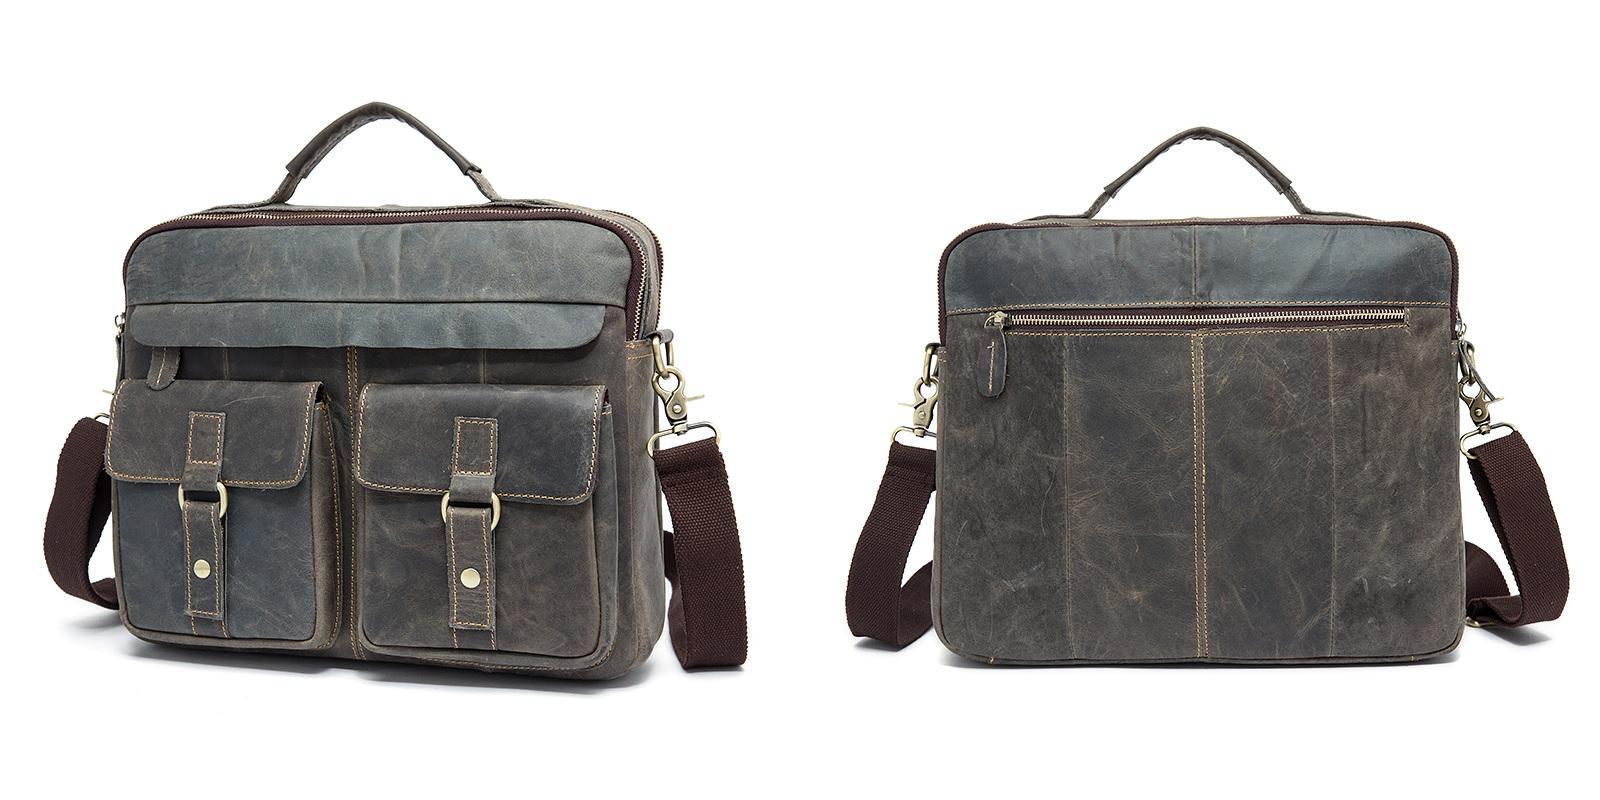 2016 New Genuine Leather Men Messenger Bag Men's Crazy Horse Leather Handbag Casual Business Laptop Shoulder Bags Briefcase Tote